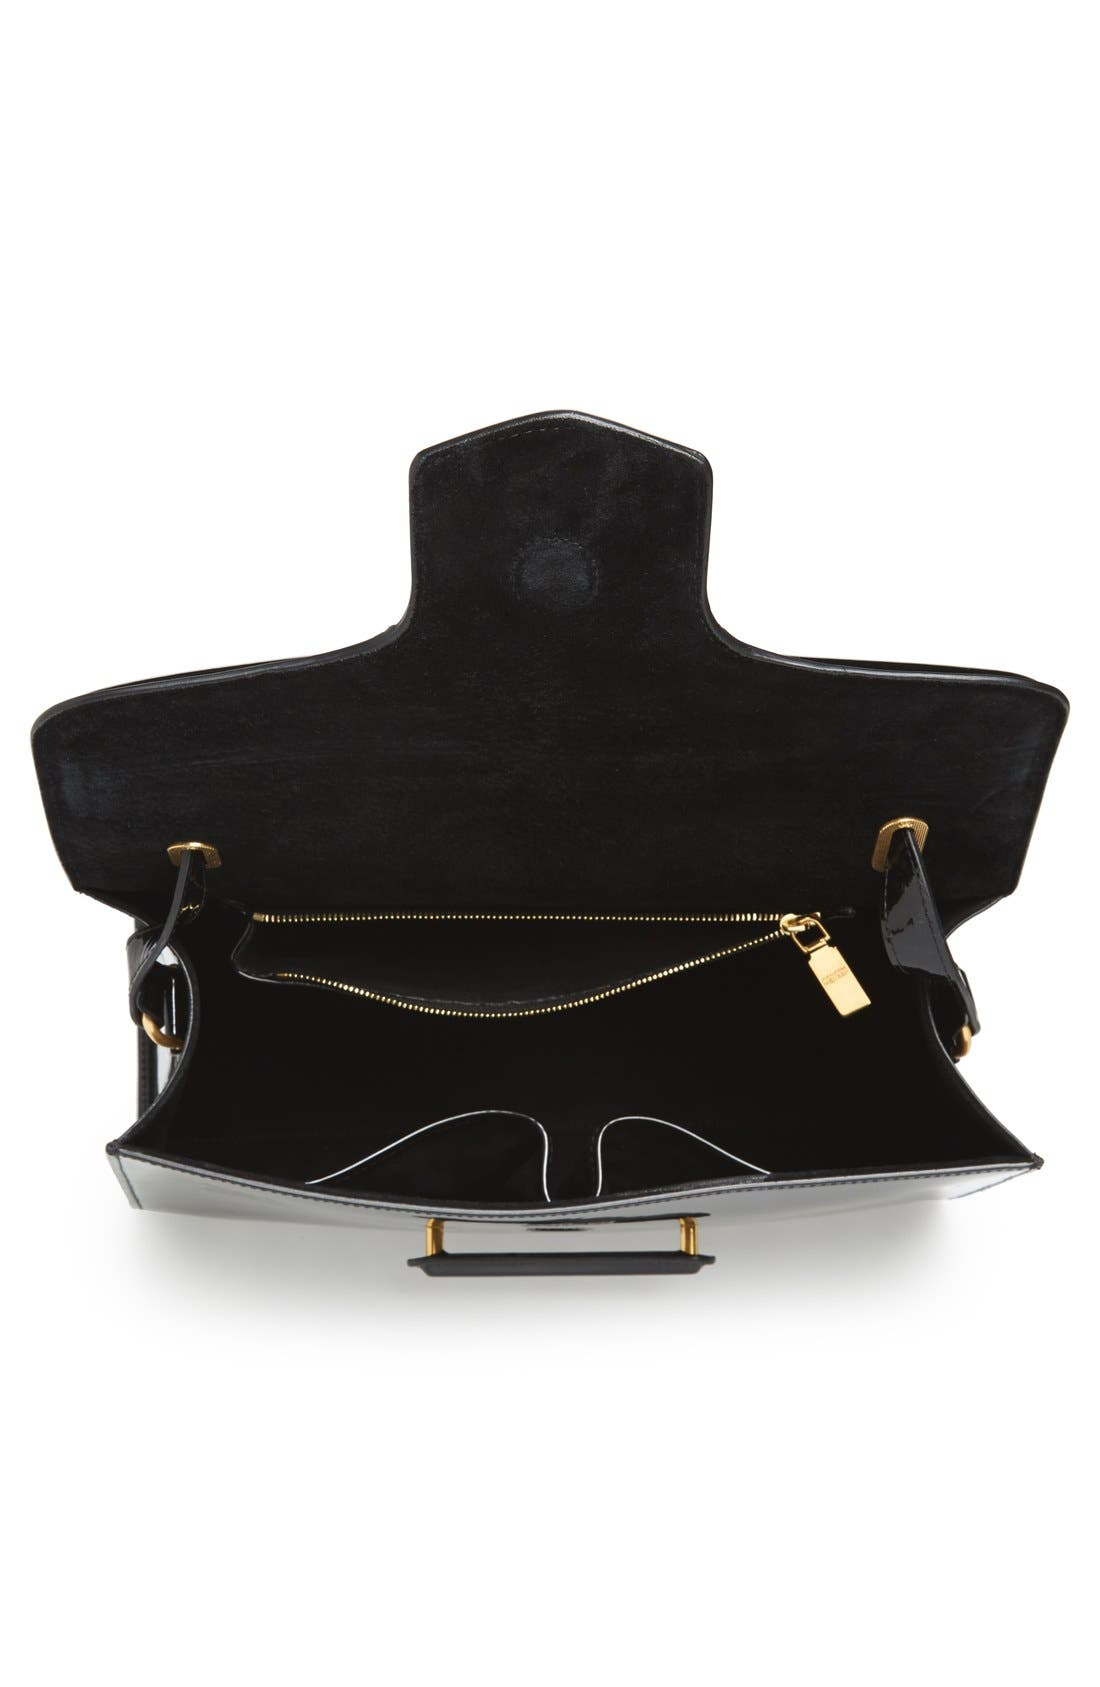 Alternate Image 3  - Alexander McQueen 'Heroine' Patent Leather Shoulder Bag